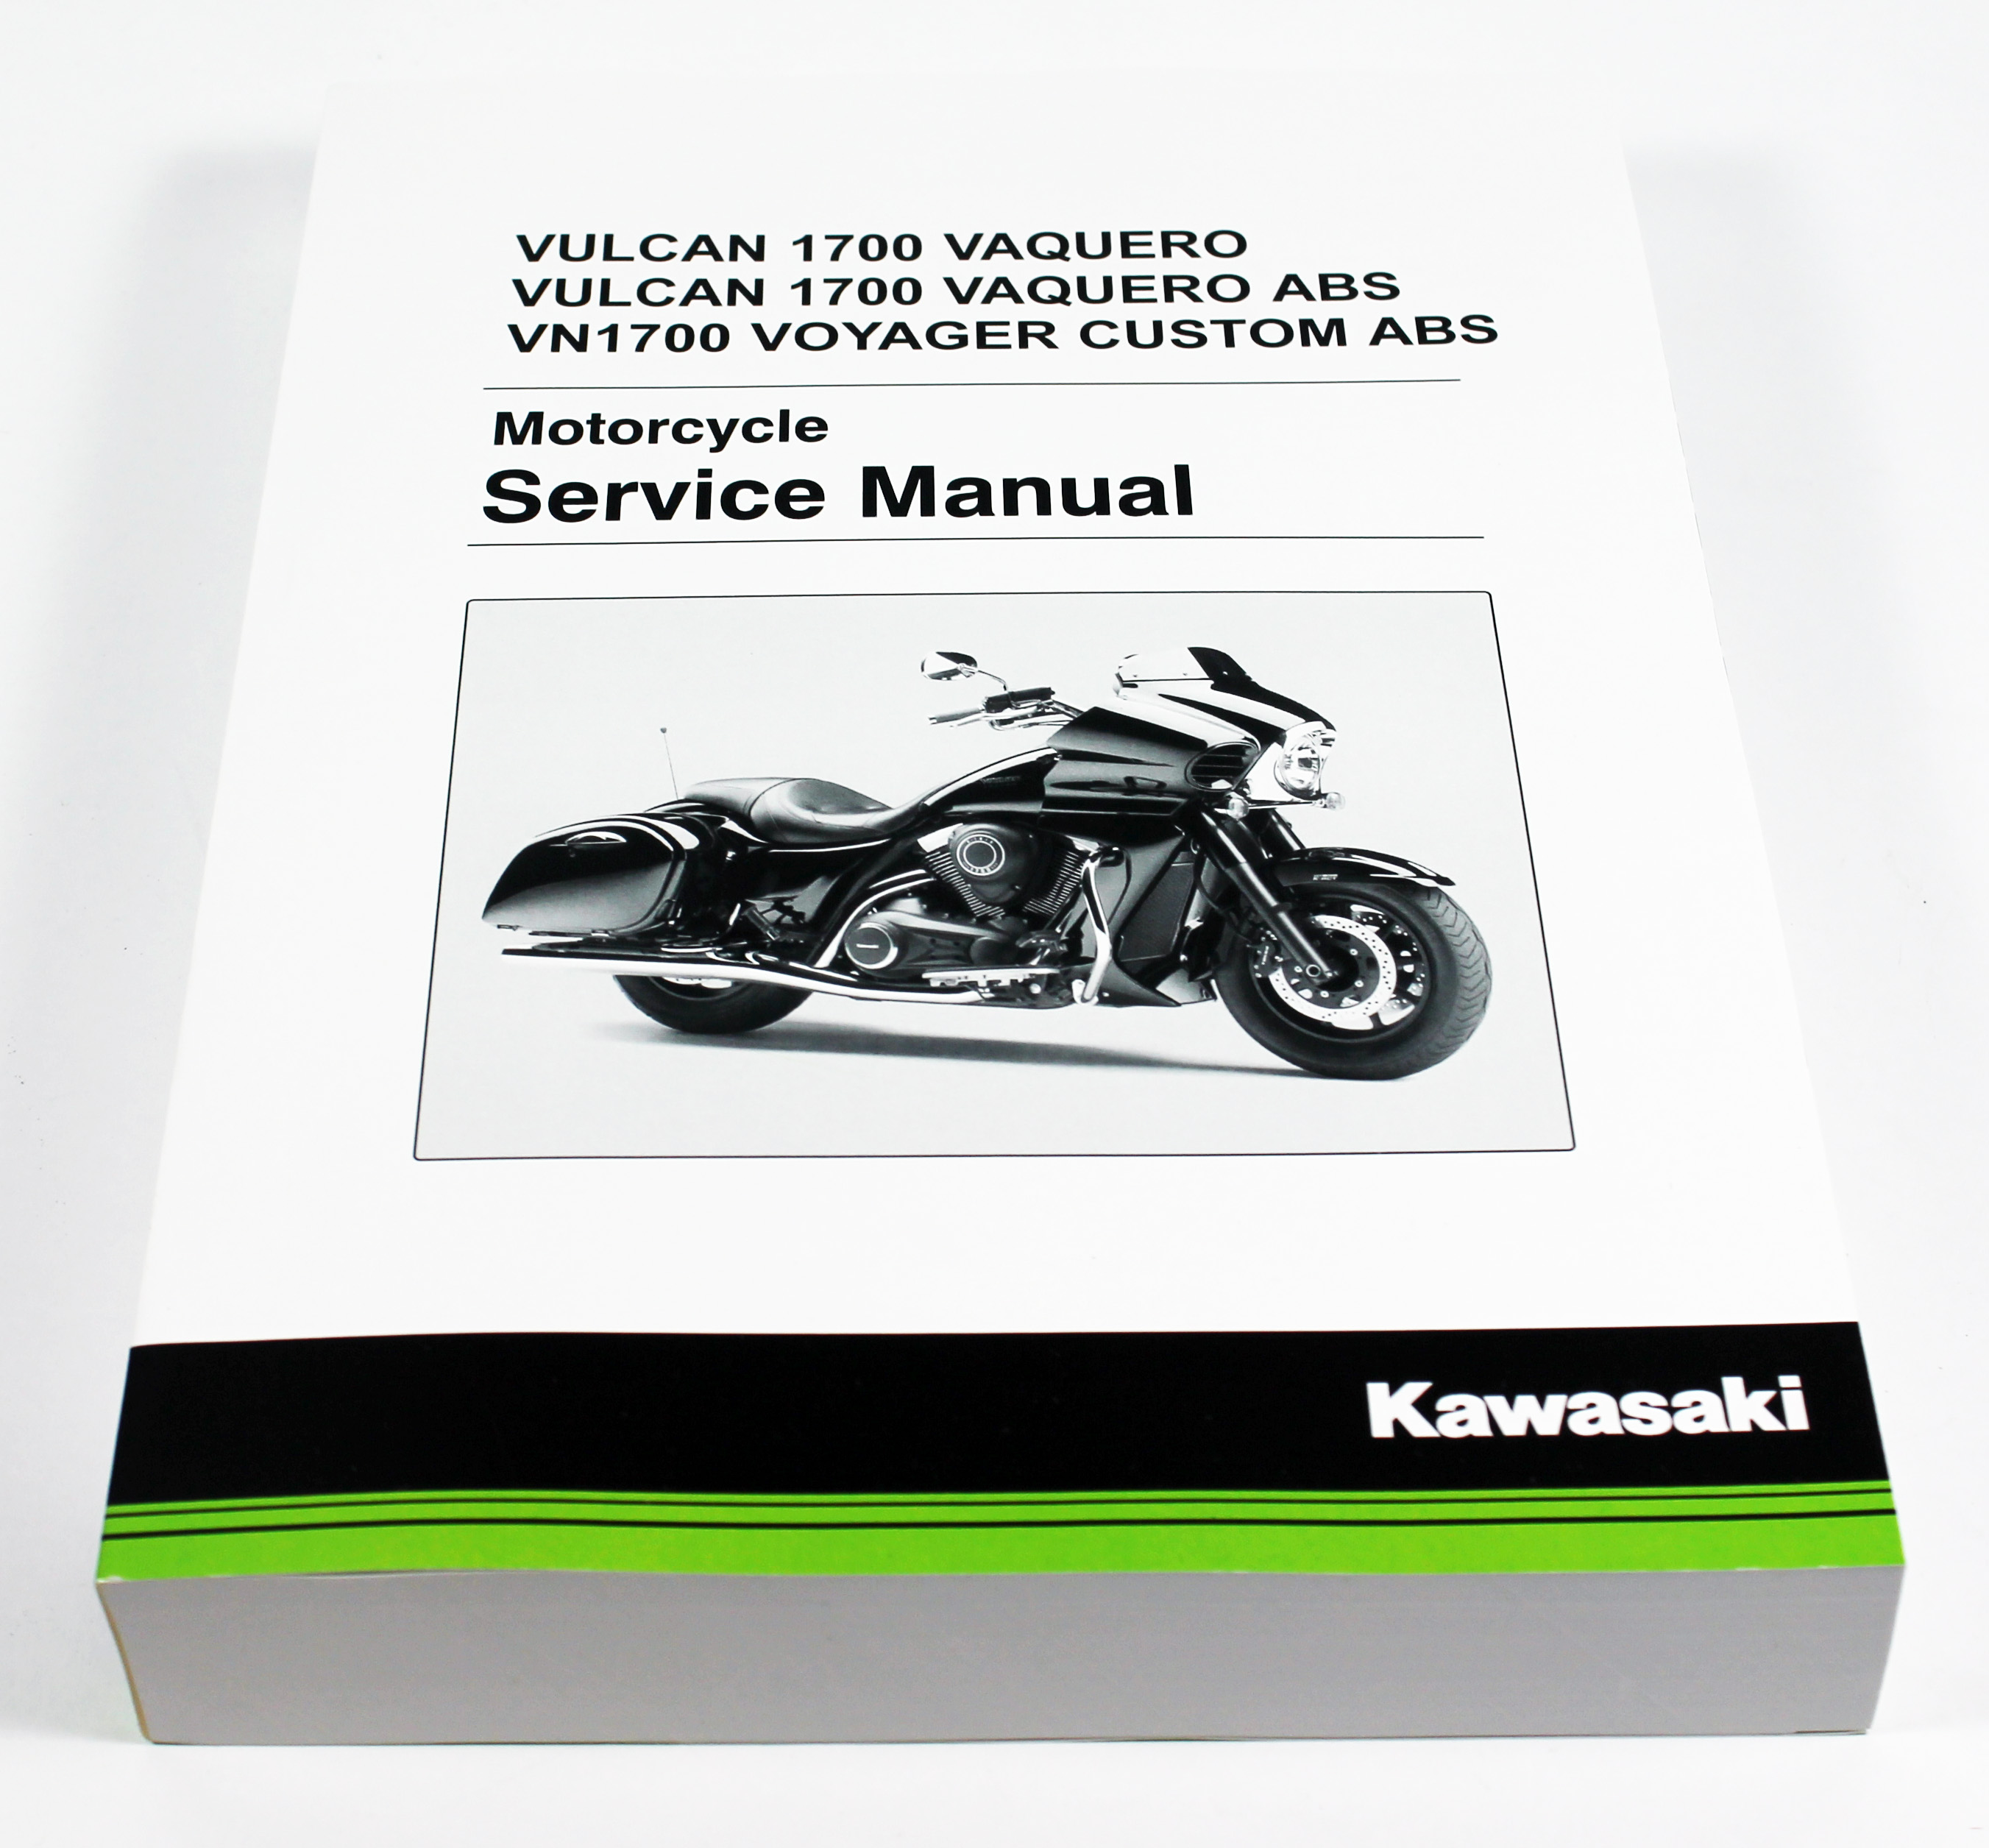 Kawasaki 2011-2018 Vulcan 1700 Vaquero Vulcan 1700 Vaquero Abs Vn1700  Service Manual 99924-1444-08 New Oem - Walmart.com